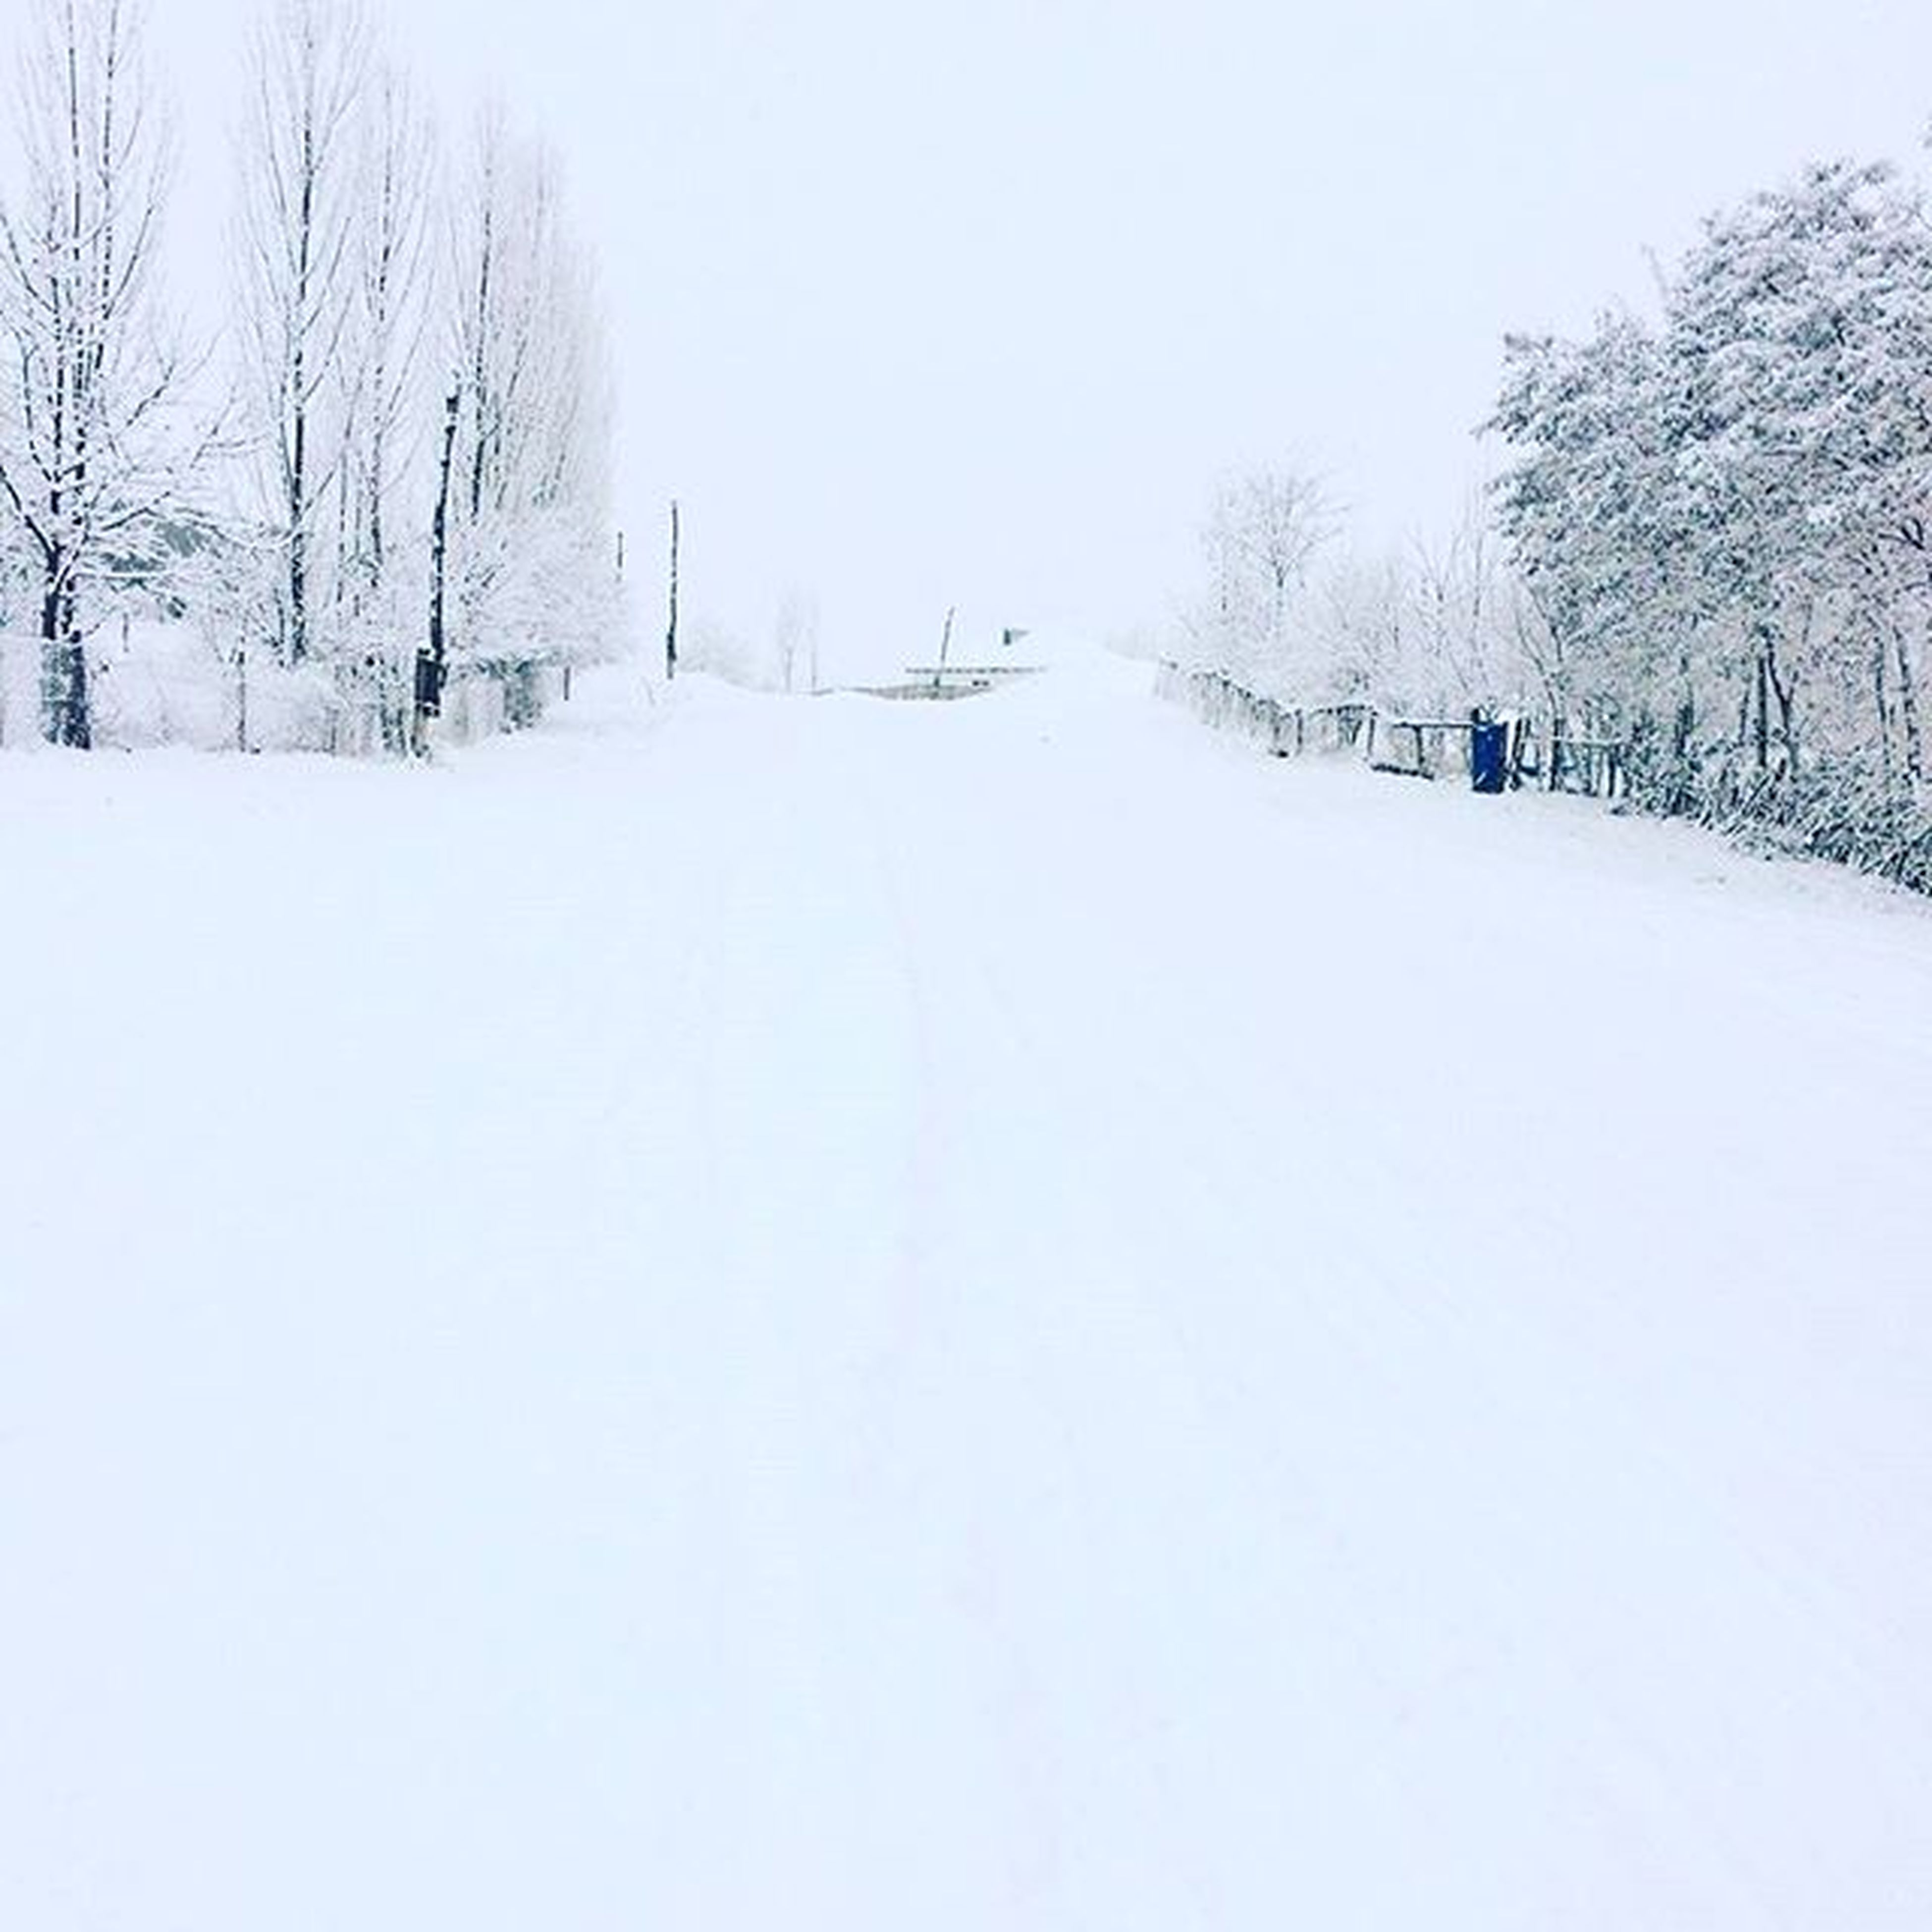 зима Дорога дорогузамело снегомпокрыт снег зимняяпора красивыипеизаж природапрекрасна